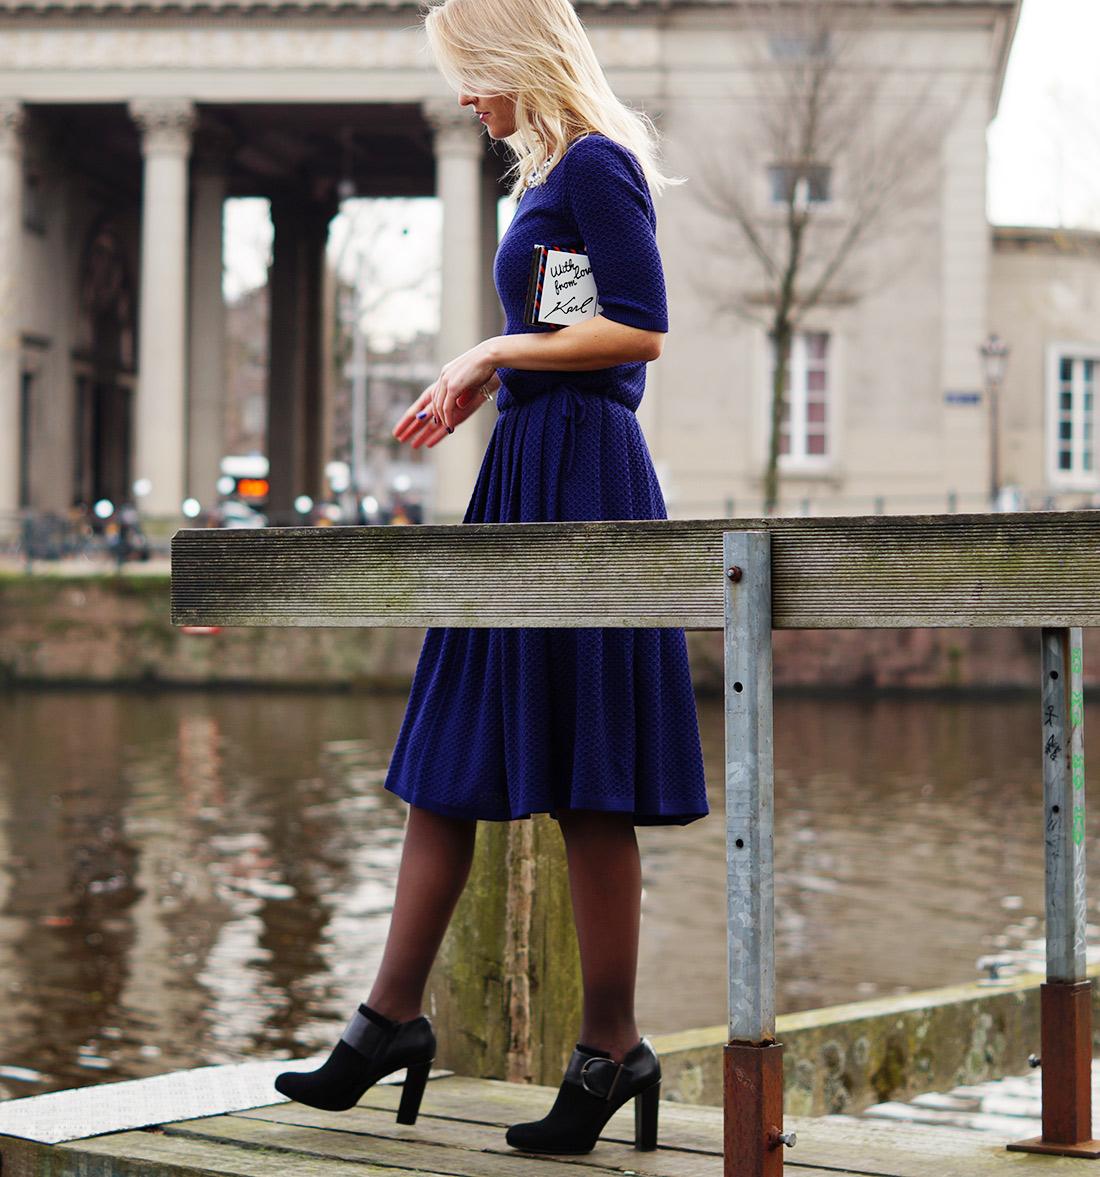 Bag-at-you---Fashion-blog---Karl-Lagerfeld-bag---Zein-Knitwear---Crystal-dress---party